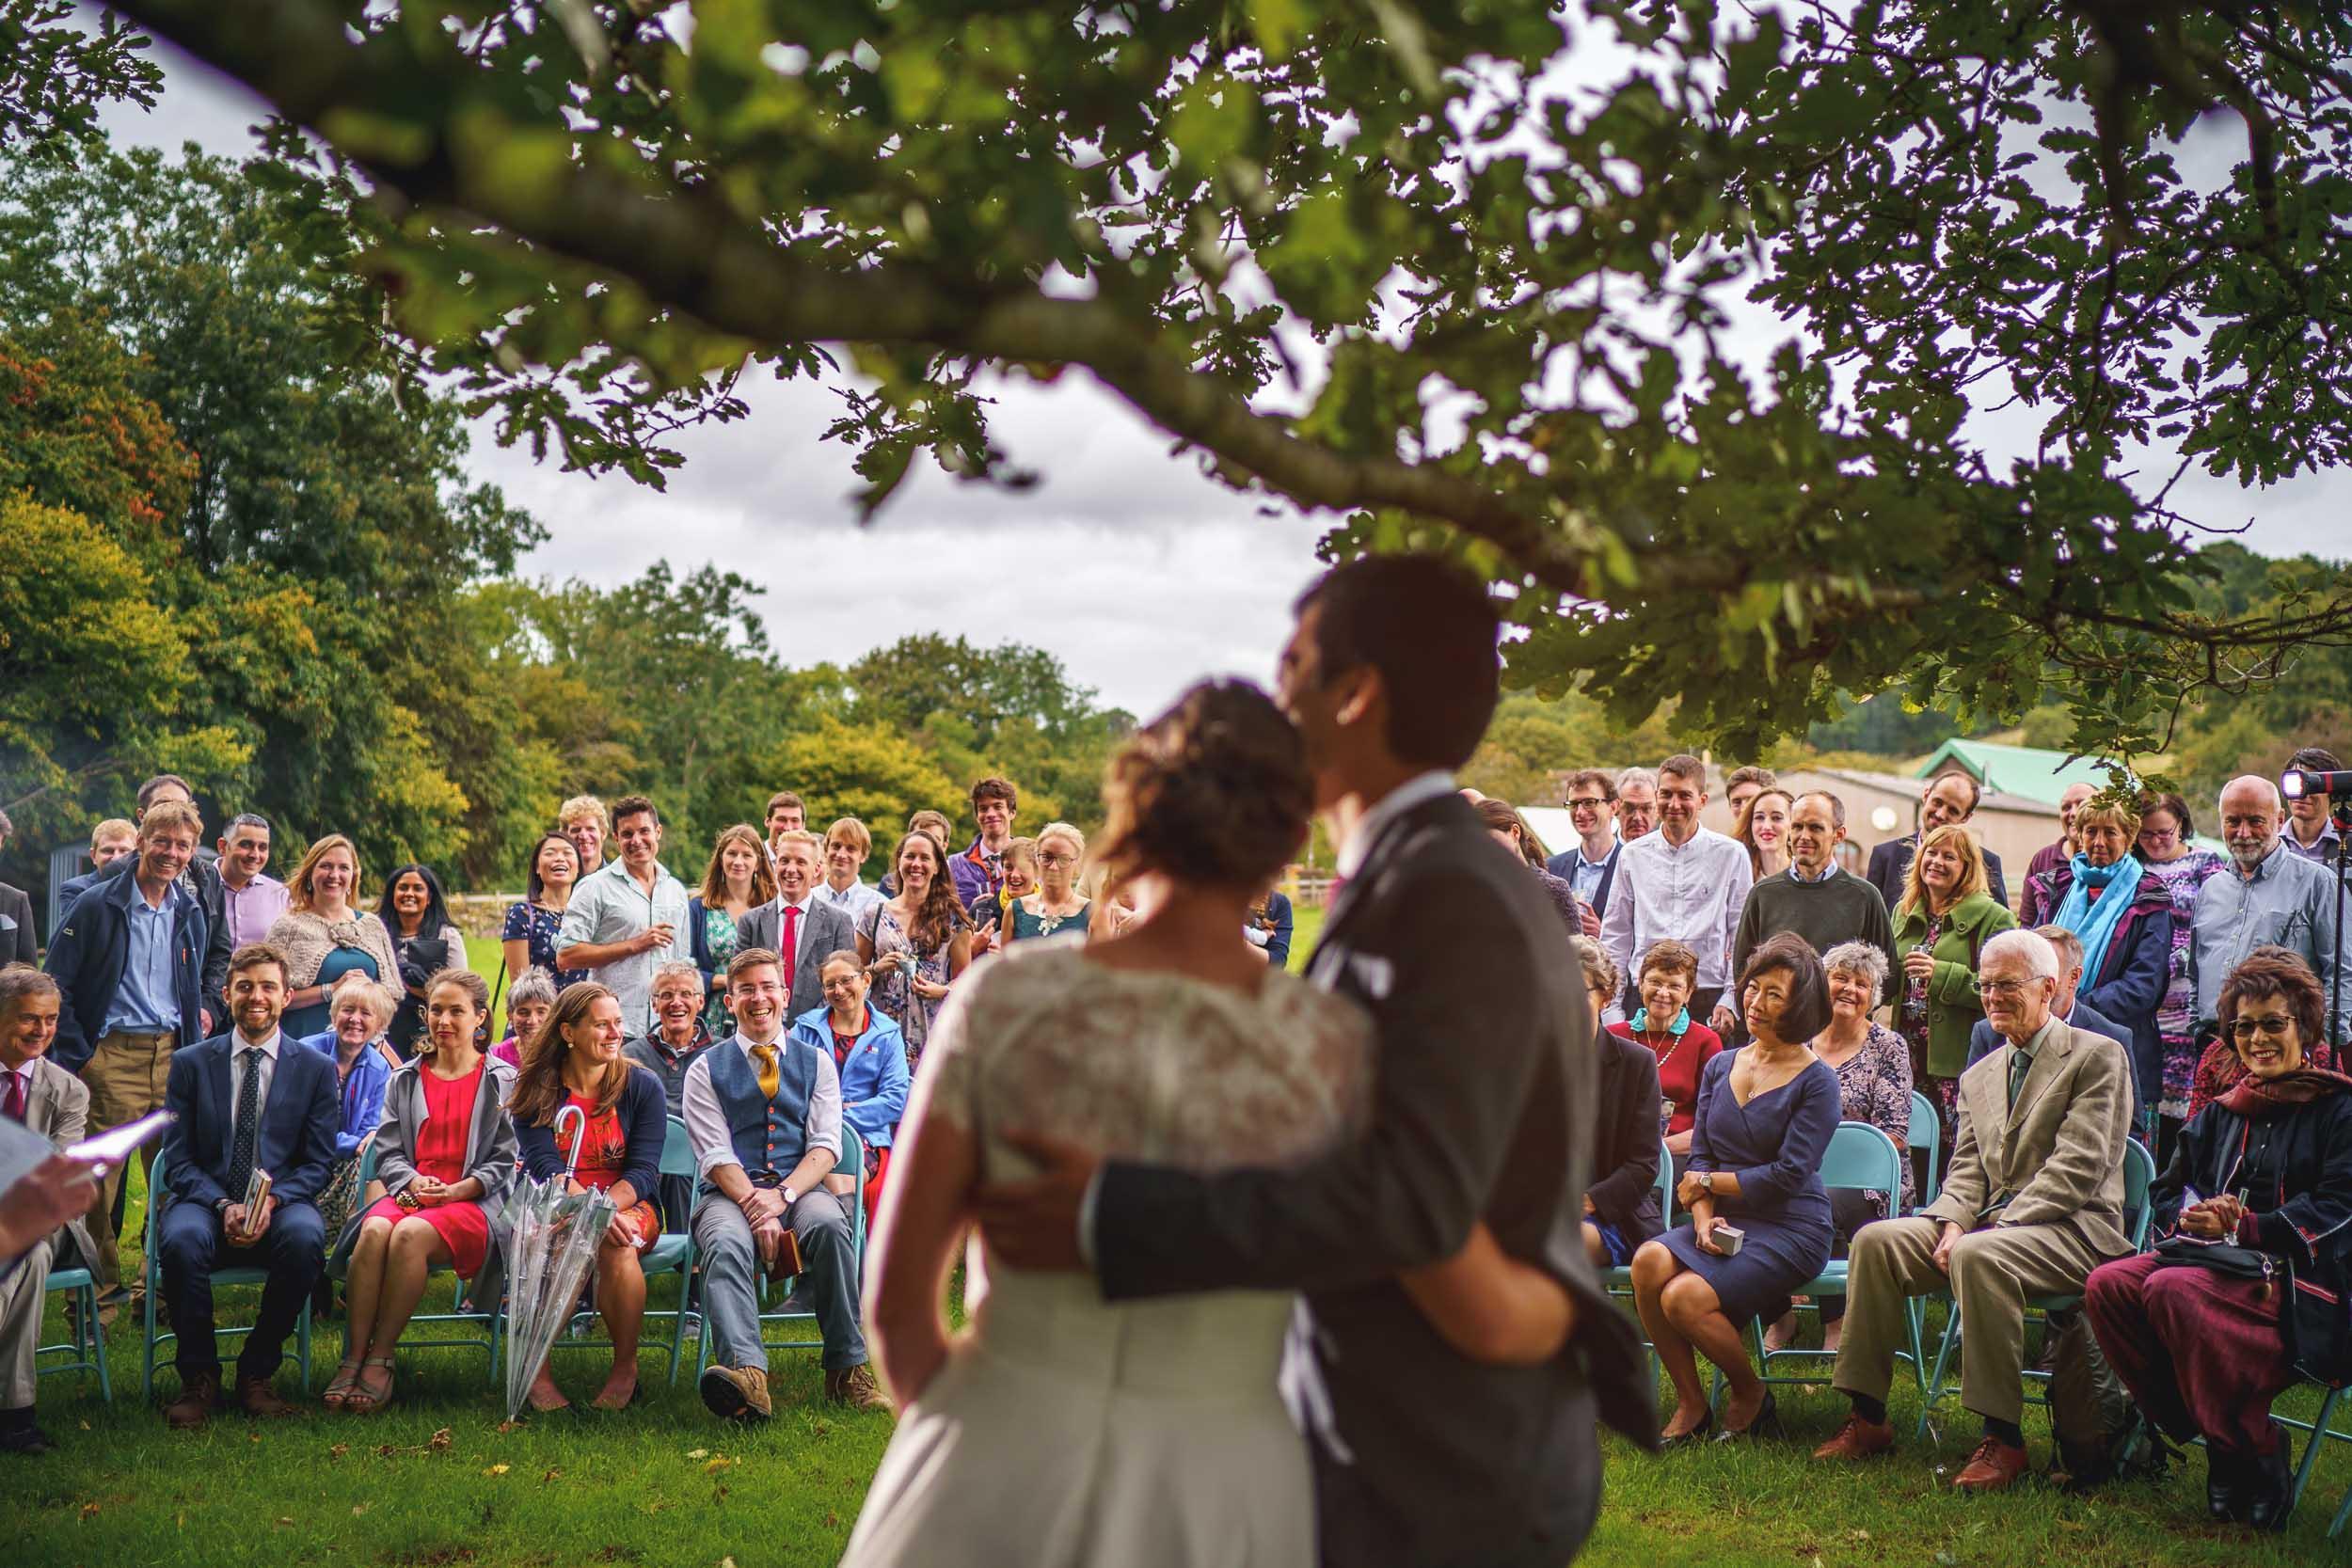 Bespoke by Nature wedding photography, Herefordshire wedding photographer, Wedding photographer in Herefordshire, Lower house farm wedding, Wedding, Bespoke by nature,